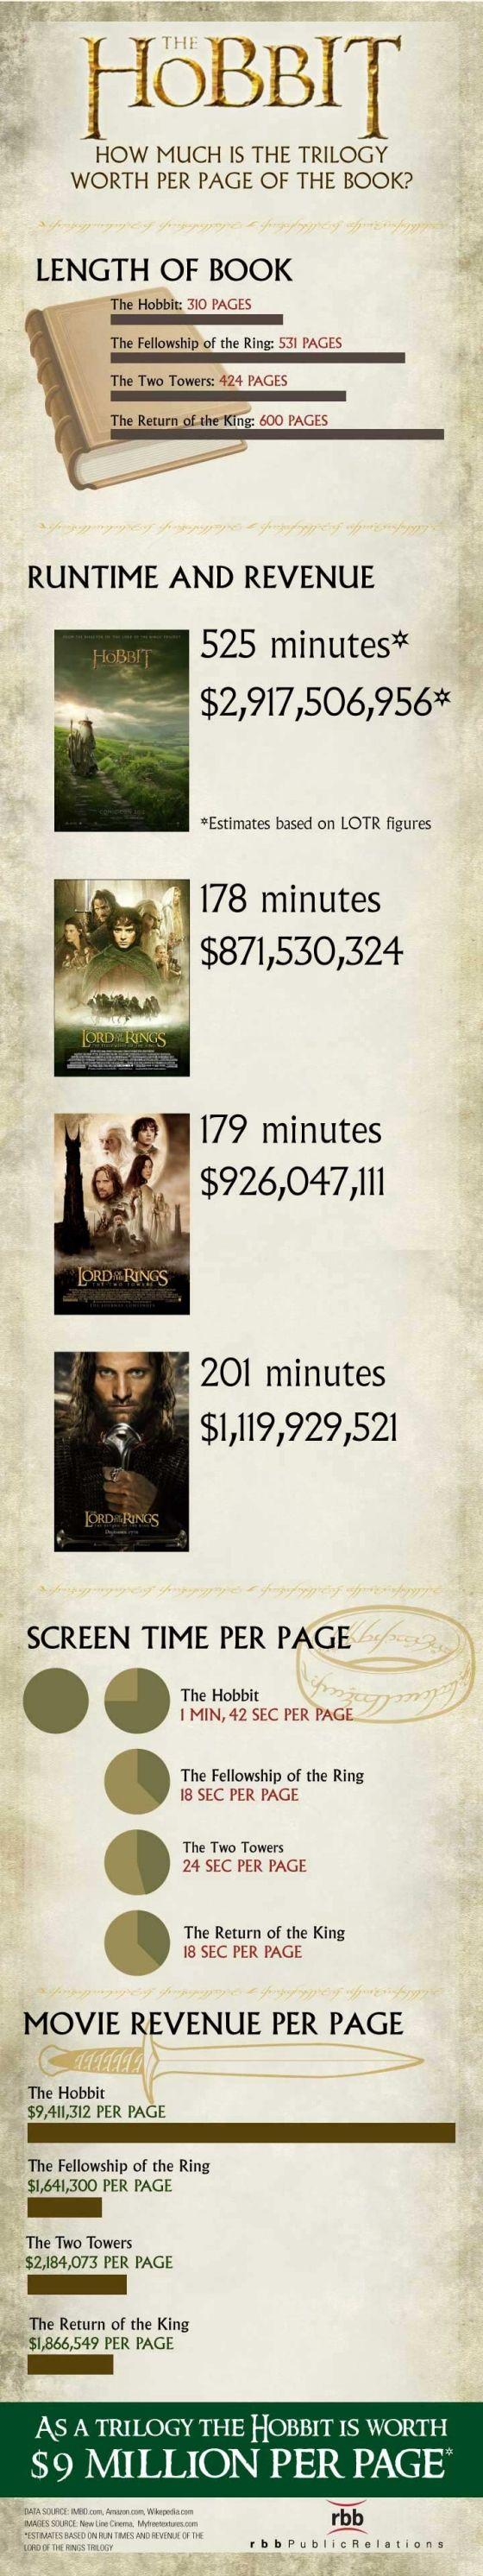 Hobbit vs LOTR movie revenue and book length infographic -- interesting!